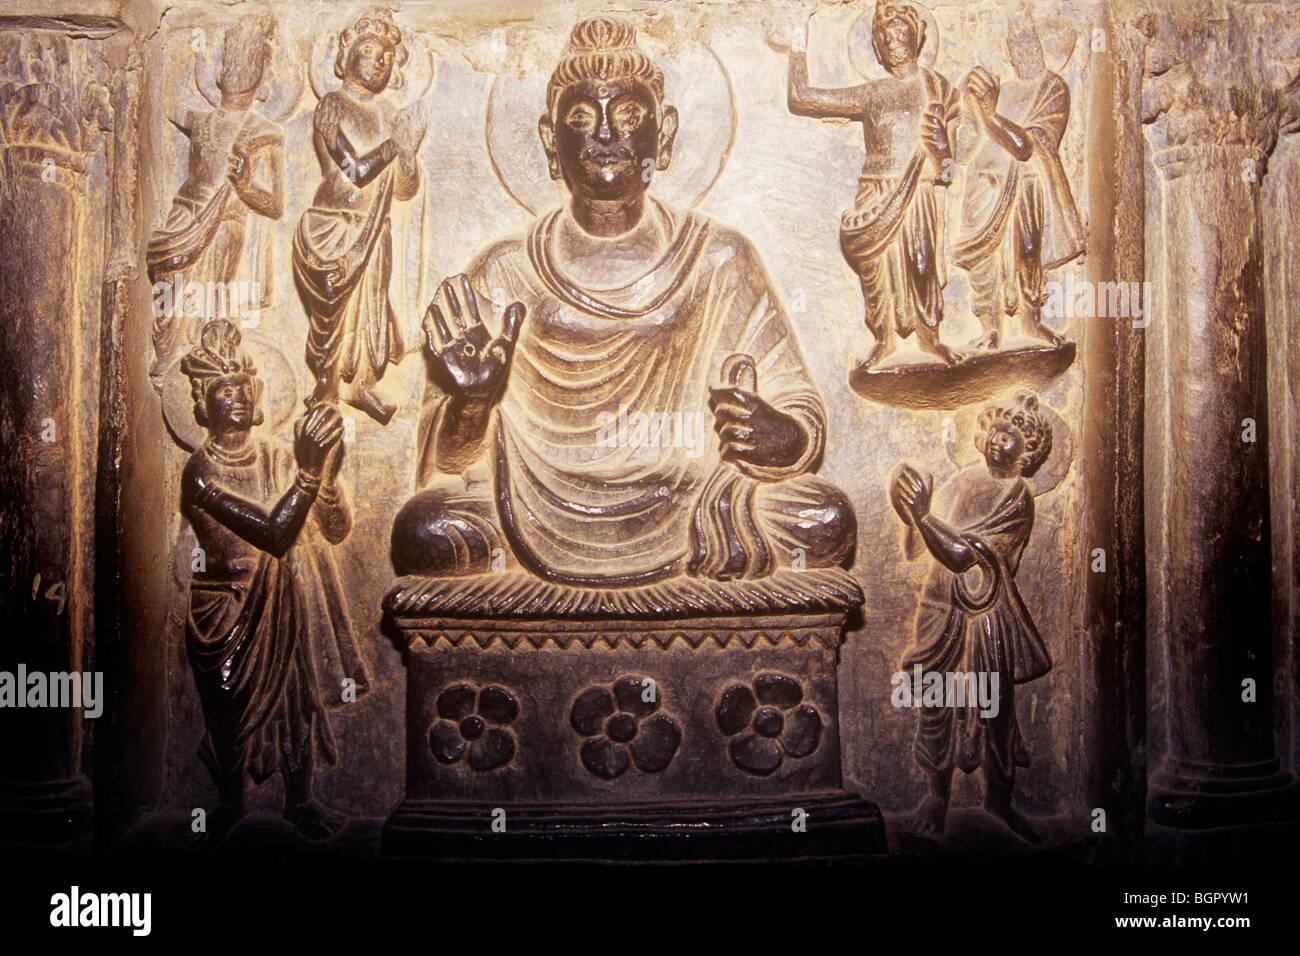 Bronze Buddha from the Gandhara civilisation Pakistan - Stock Image